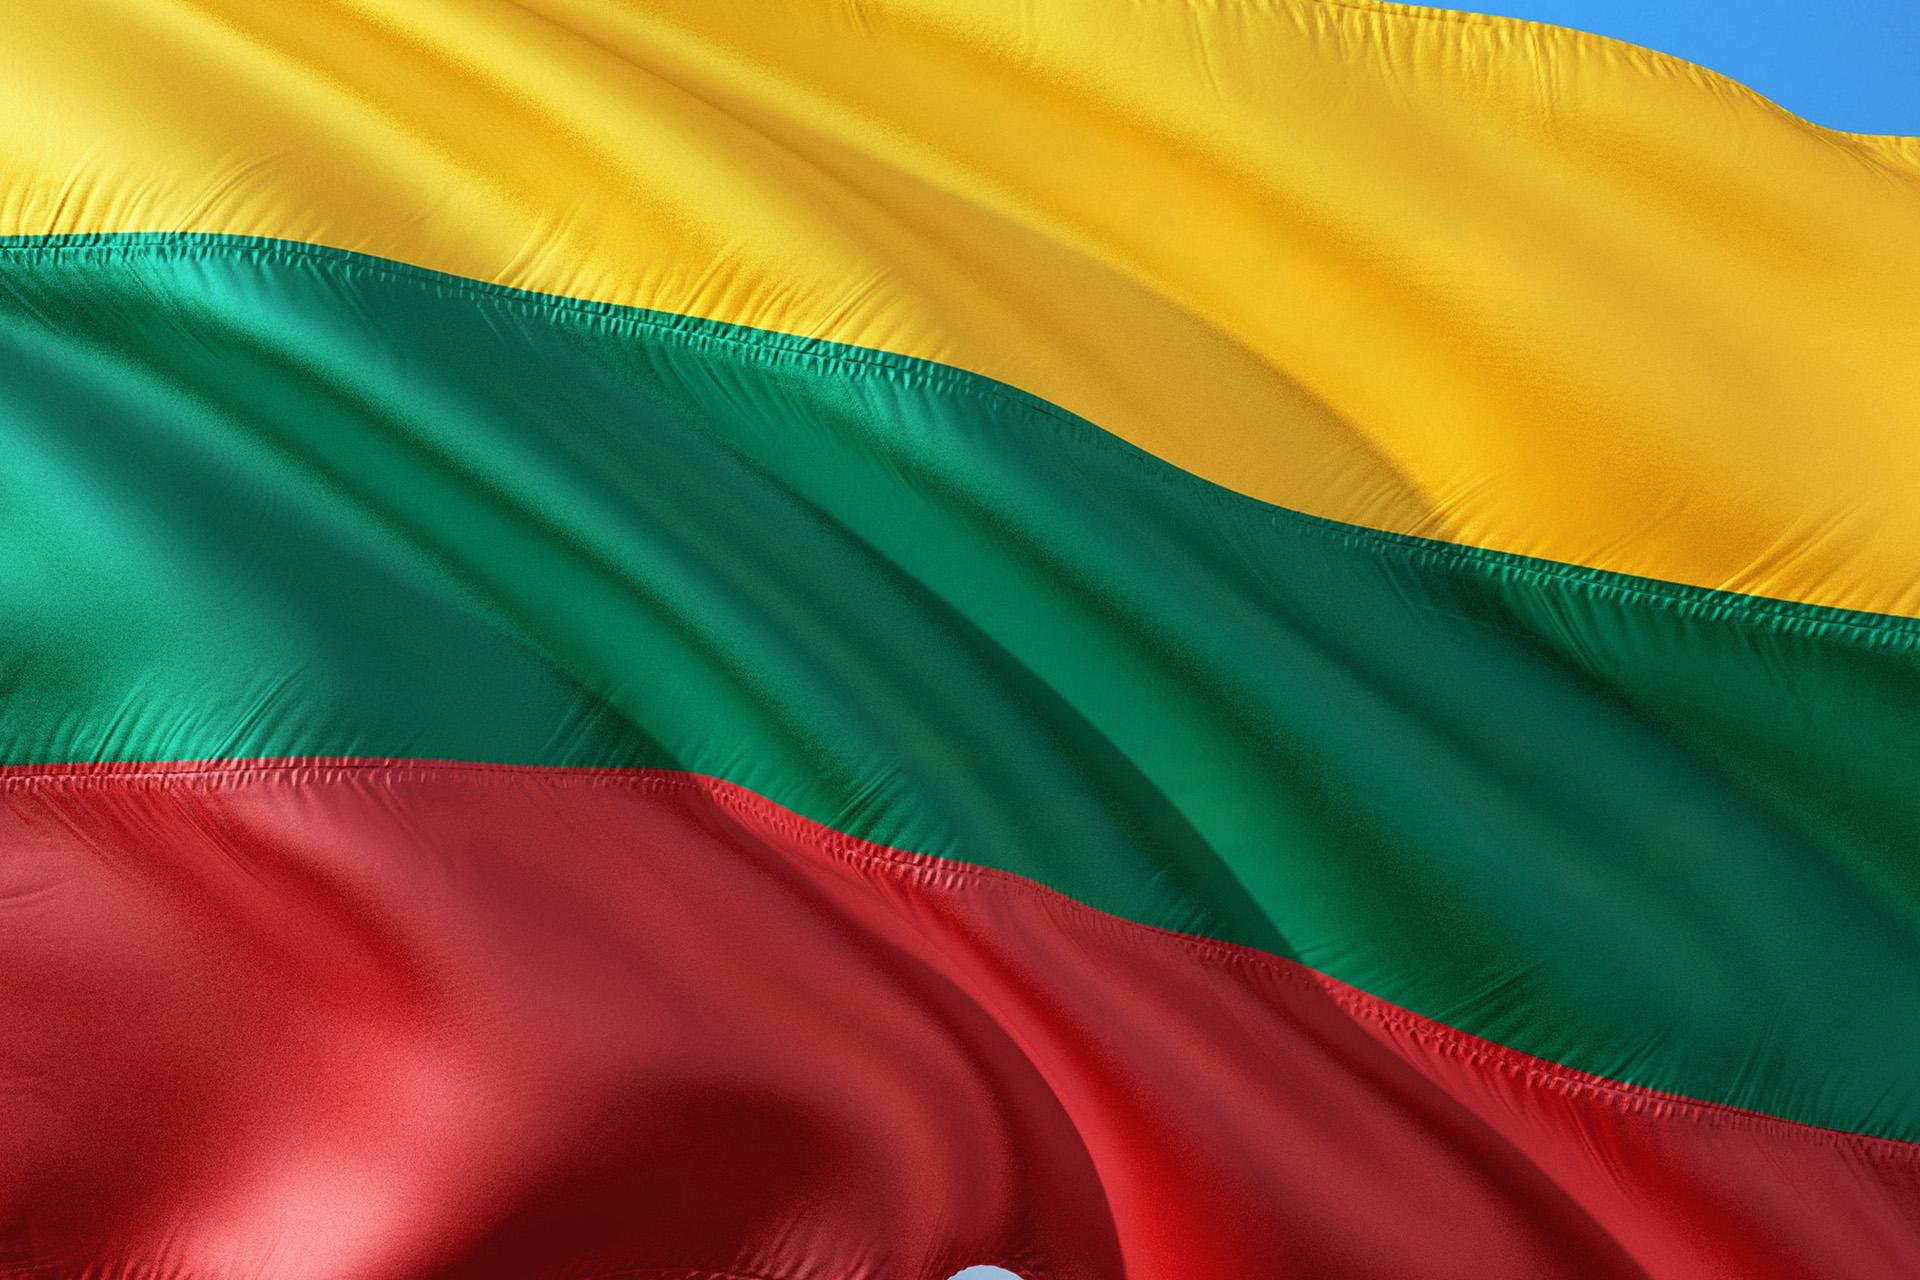 lithuaniaFlag